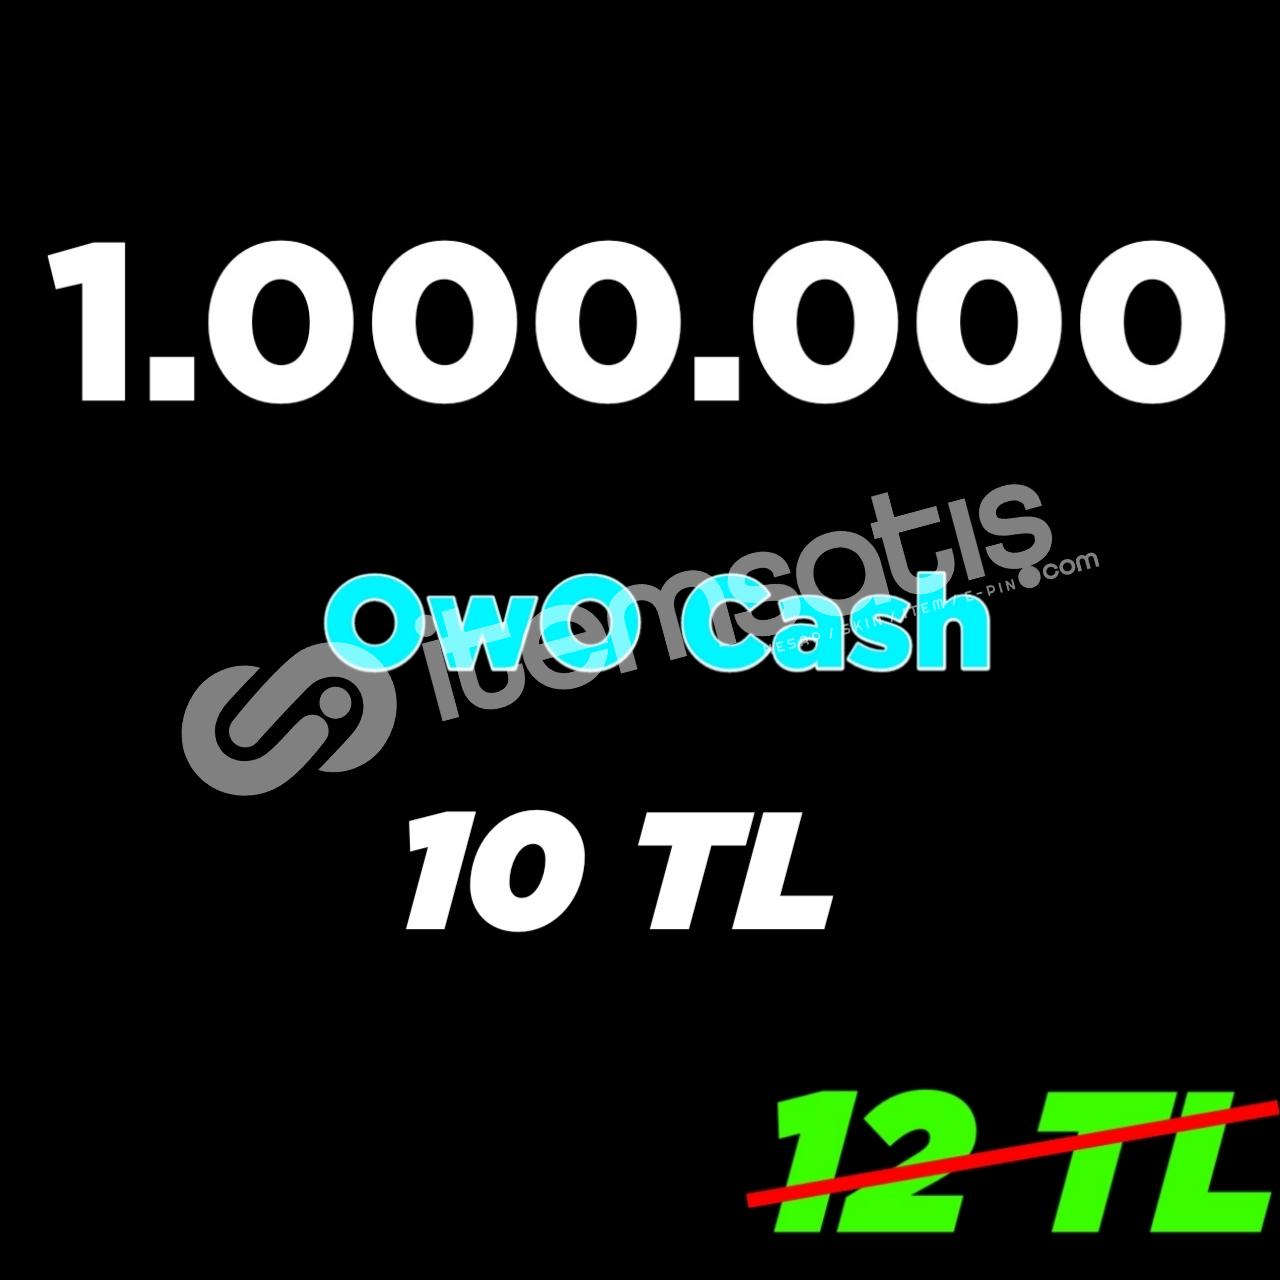 1 Milyon OwO 10 TL